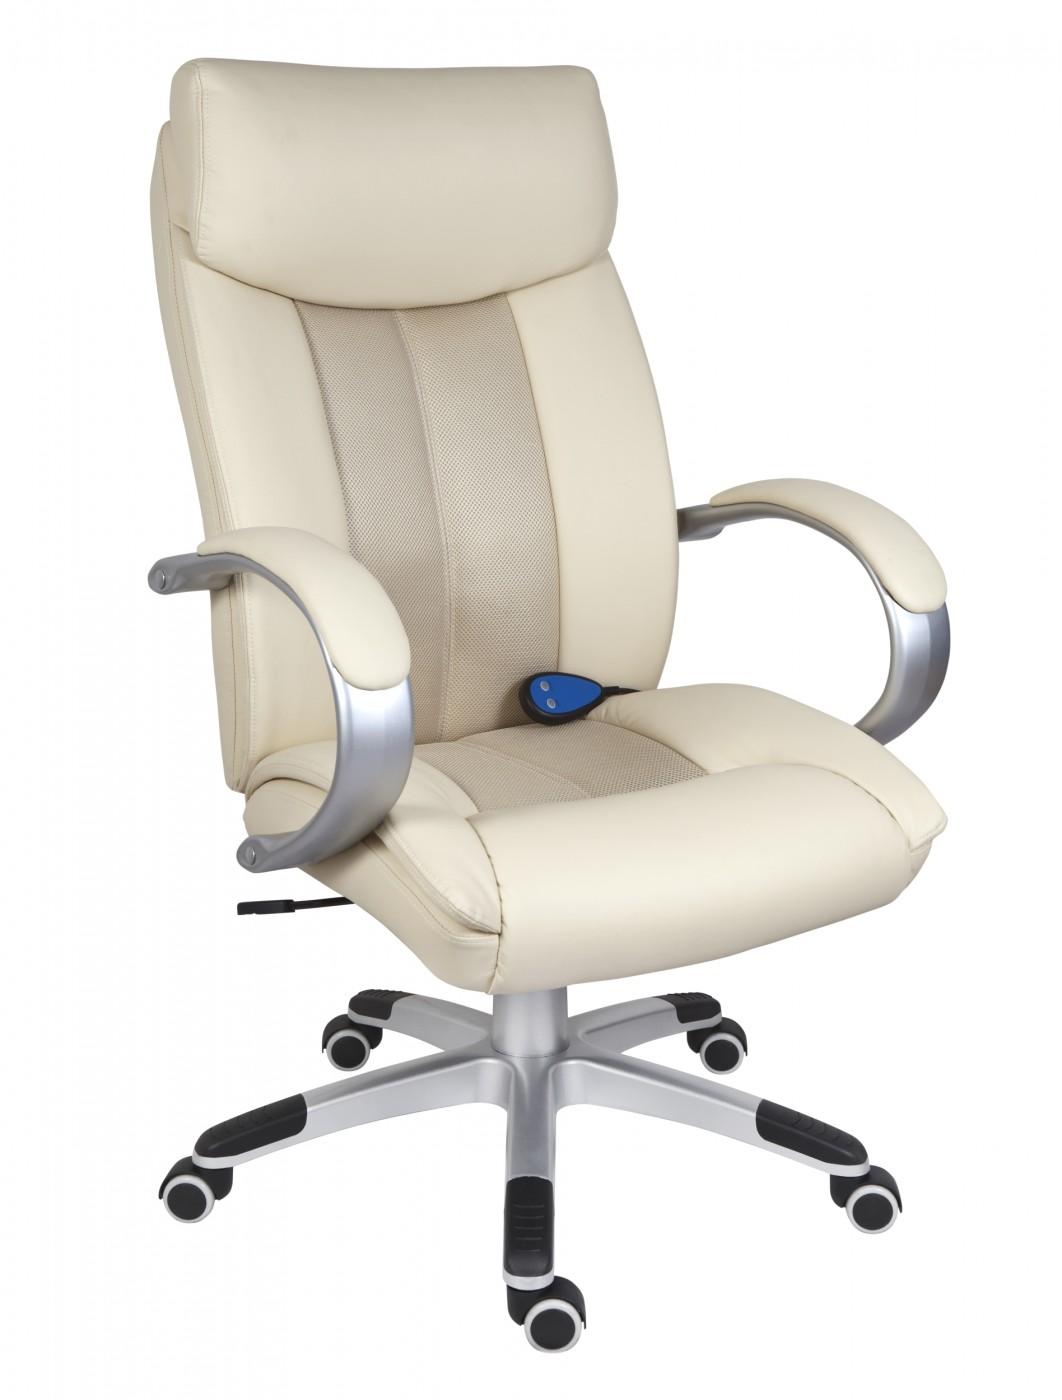 shiatsu massage chair 121 office furniture. Black Bedroom Furniture Sets. Home Design Ideas